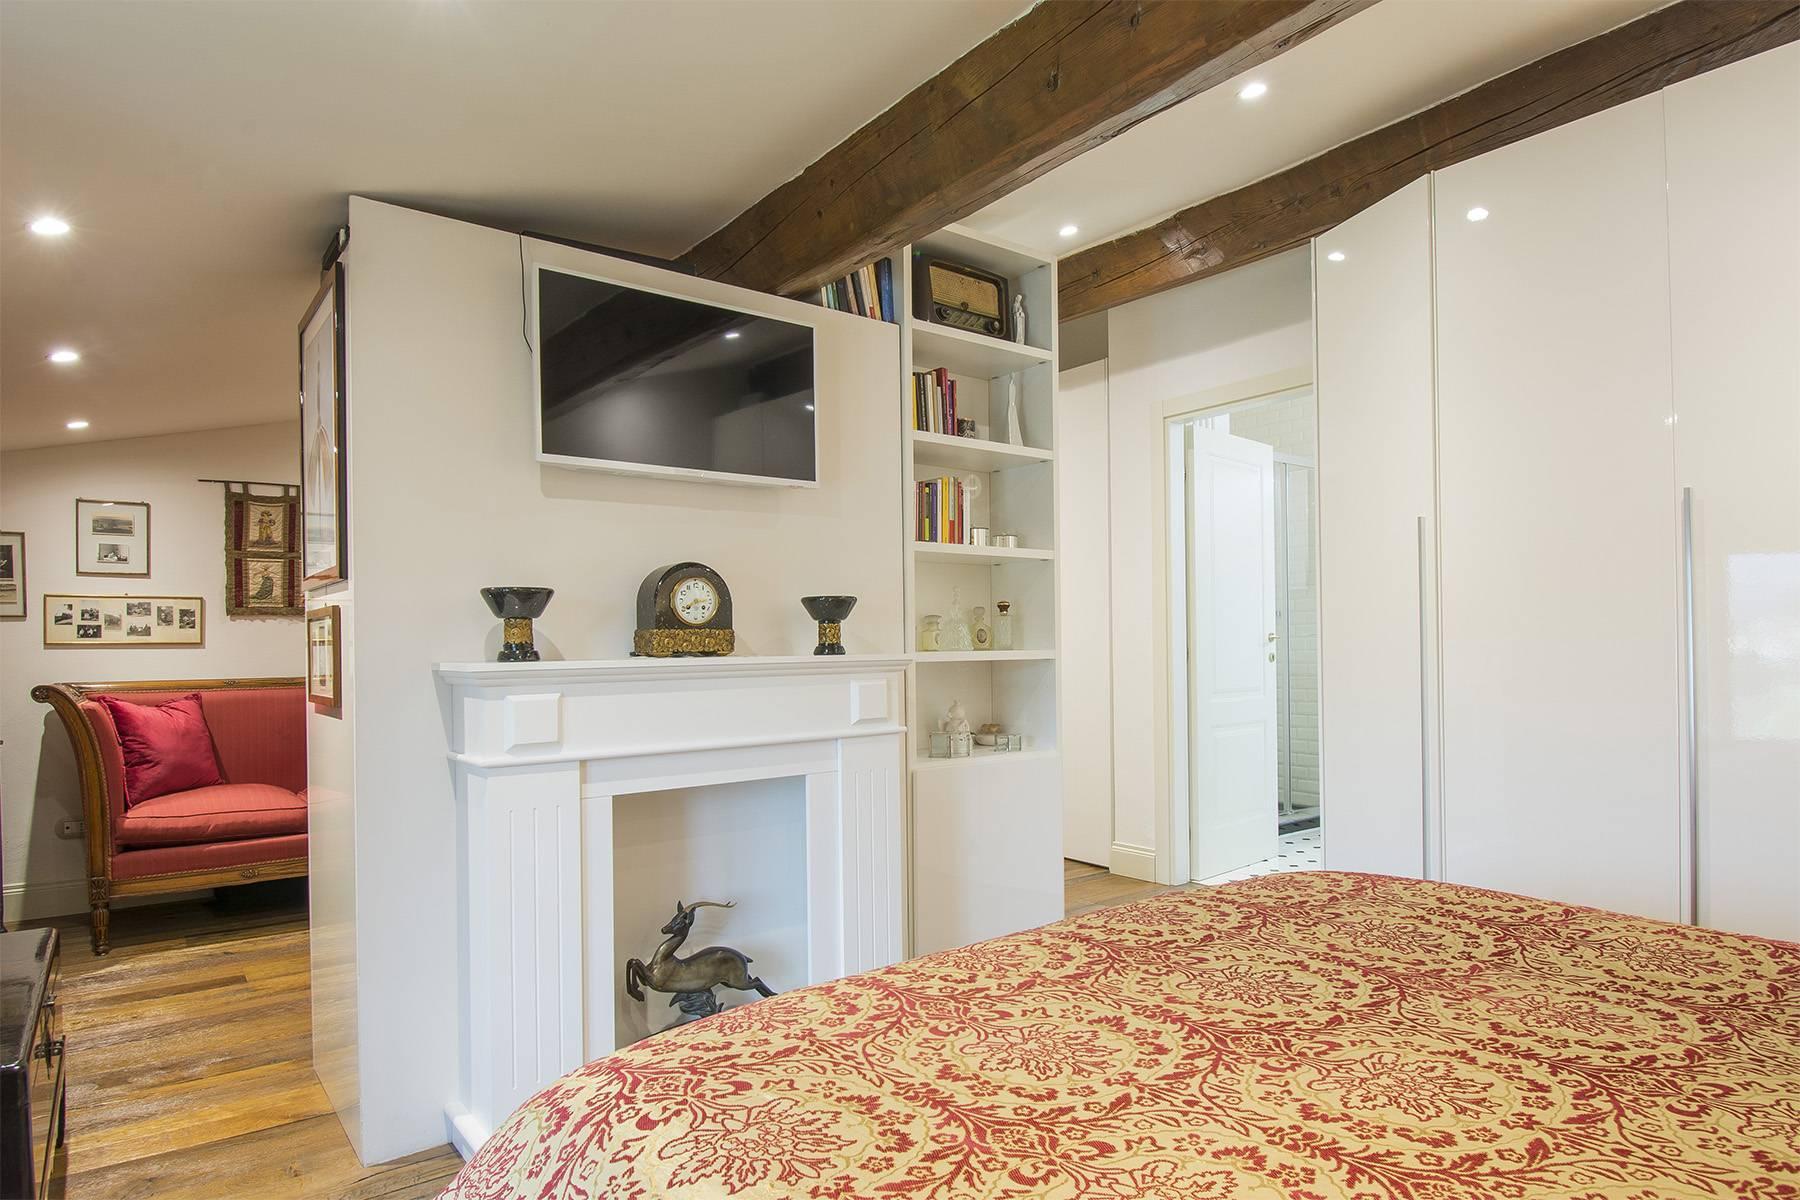 Exquisite apartment within a historic villa - 9